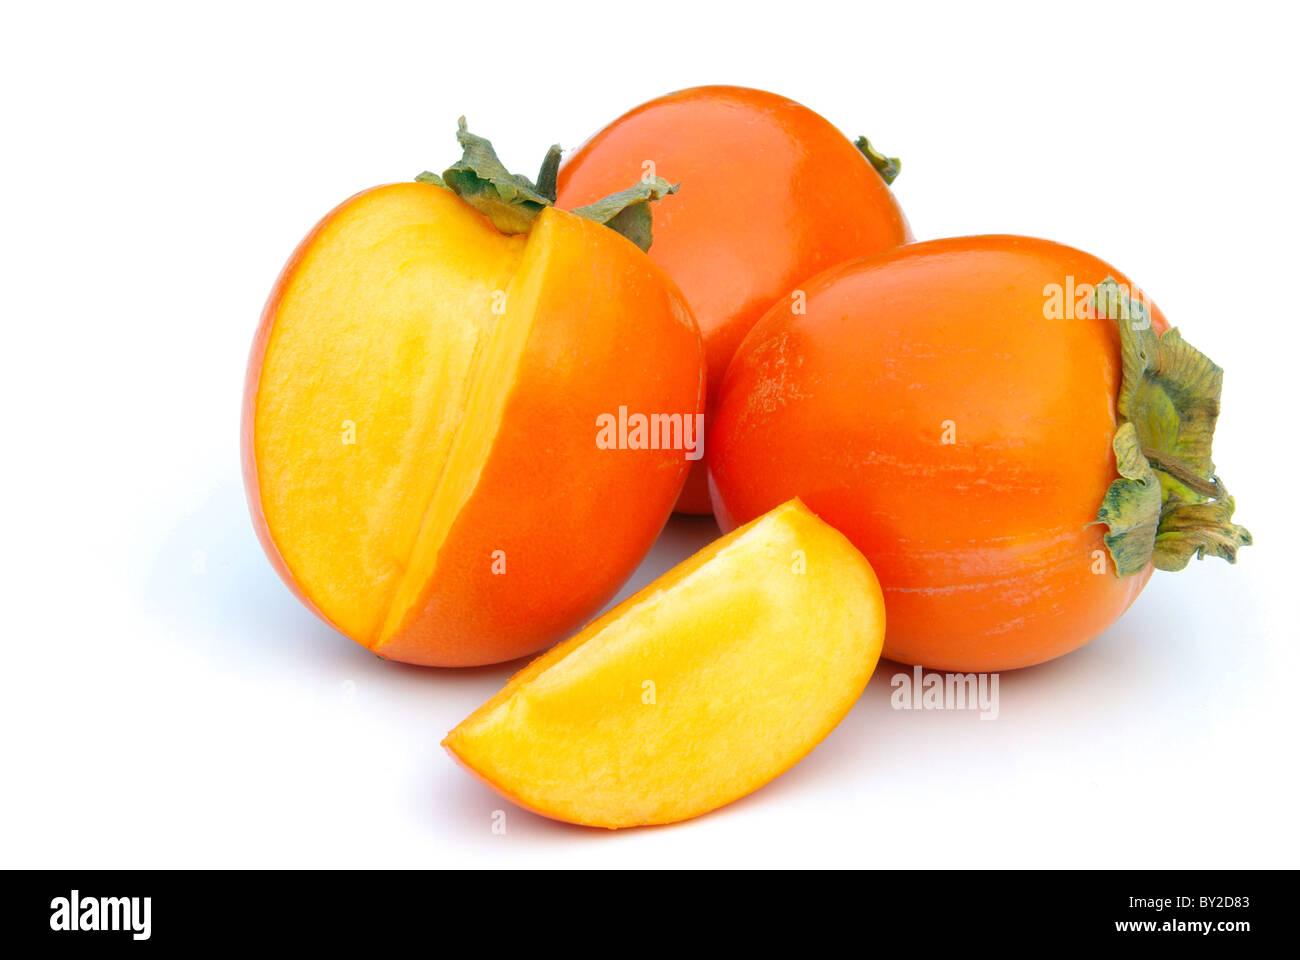 Kaki - Japanese Persimmon 15 - Stock Image